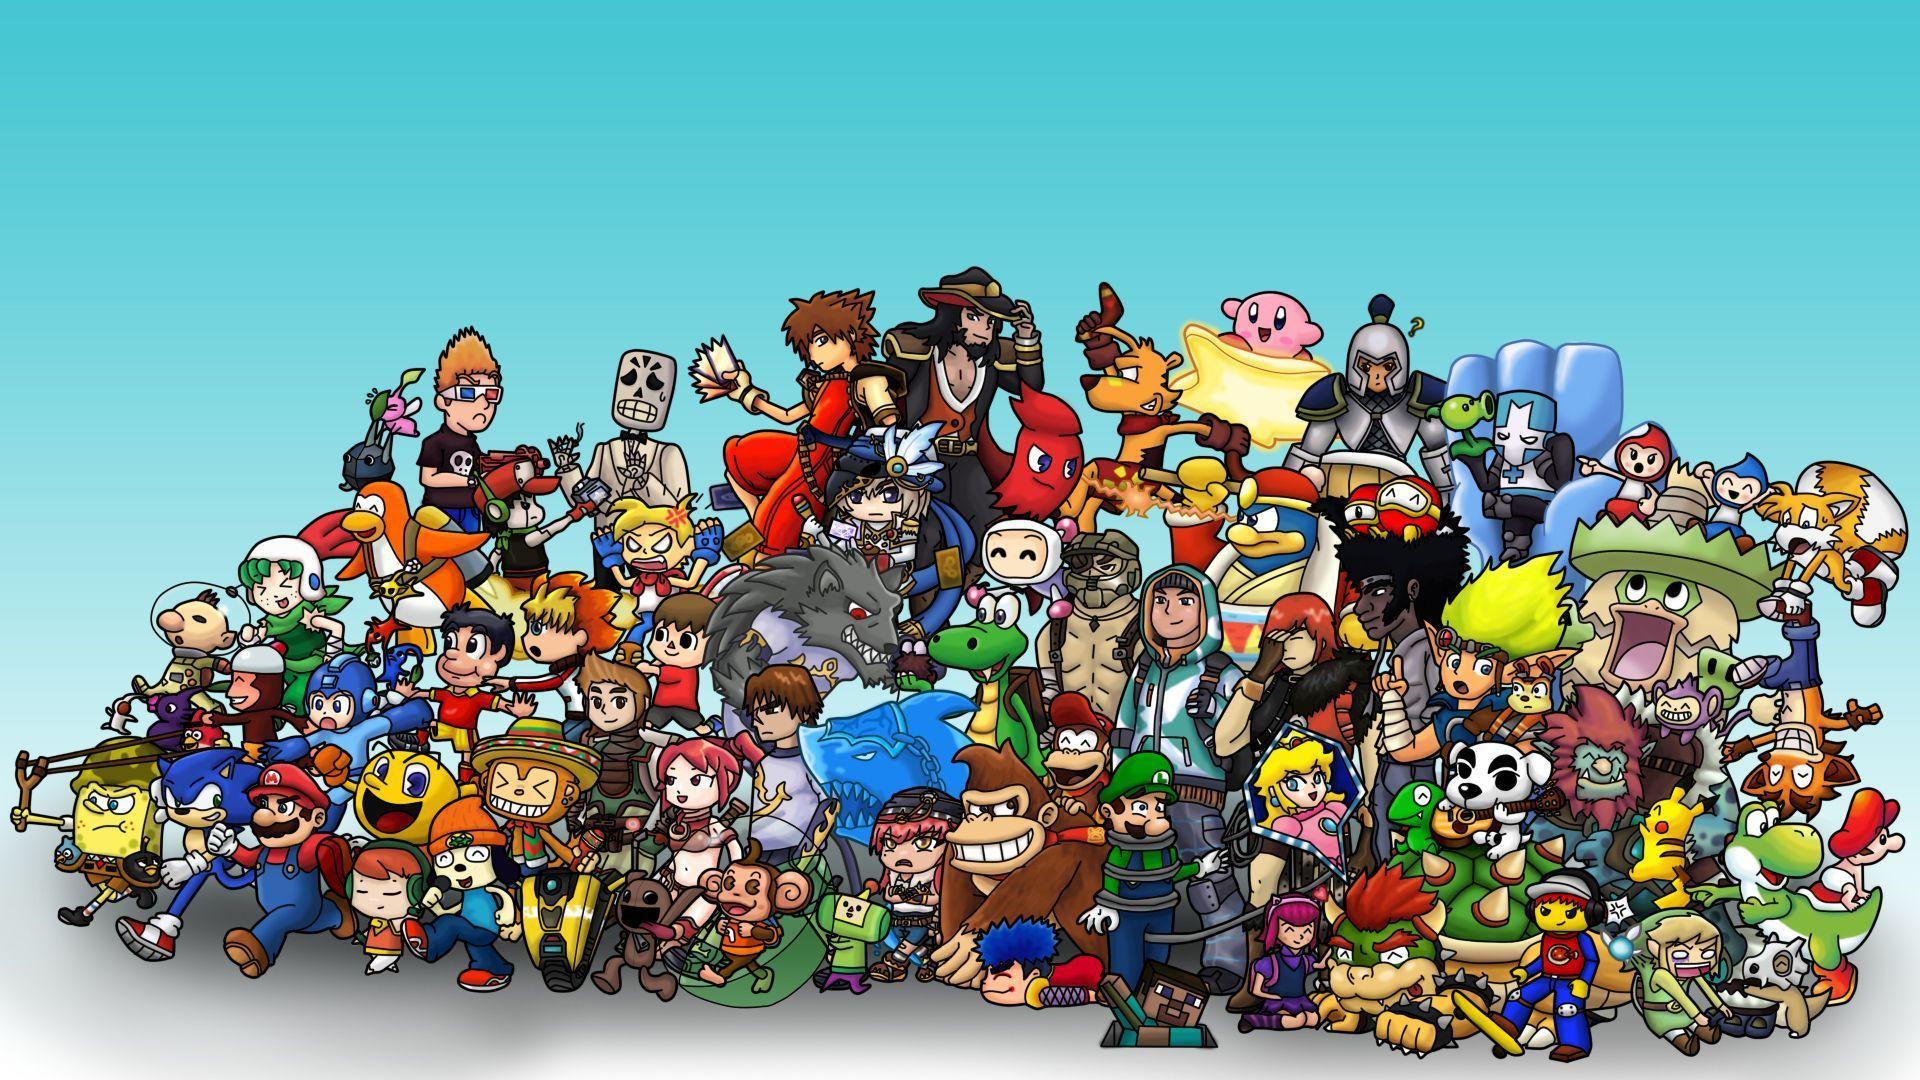 Cartoon Games Wallpapers Top Free Cartoon Games Backgrounds Wallpaperaccess